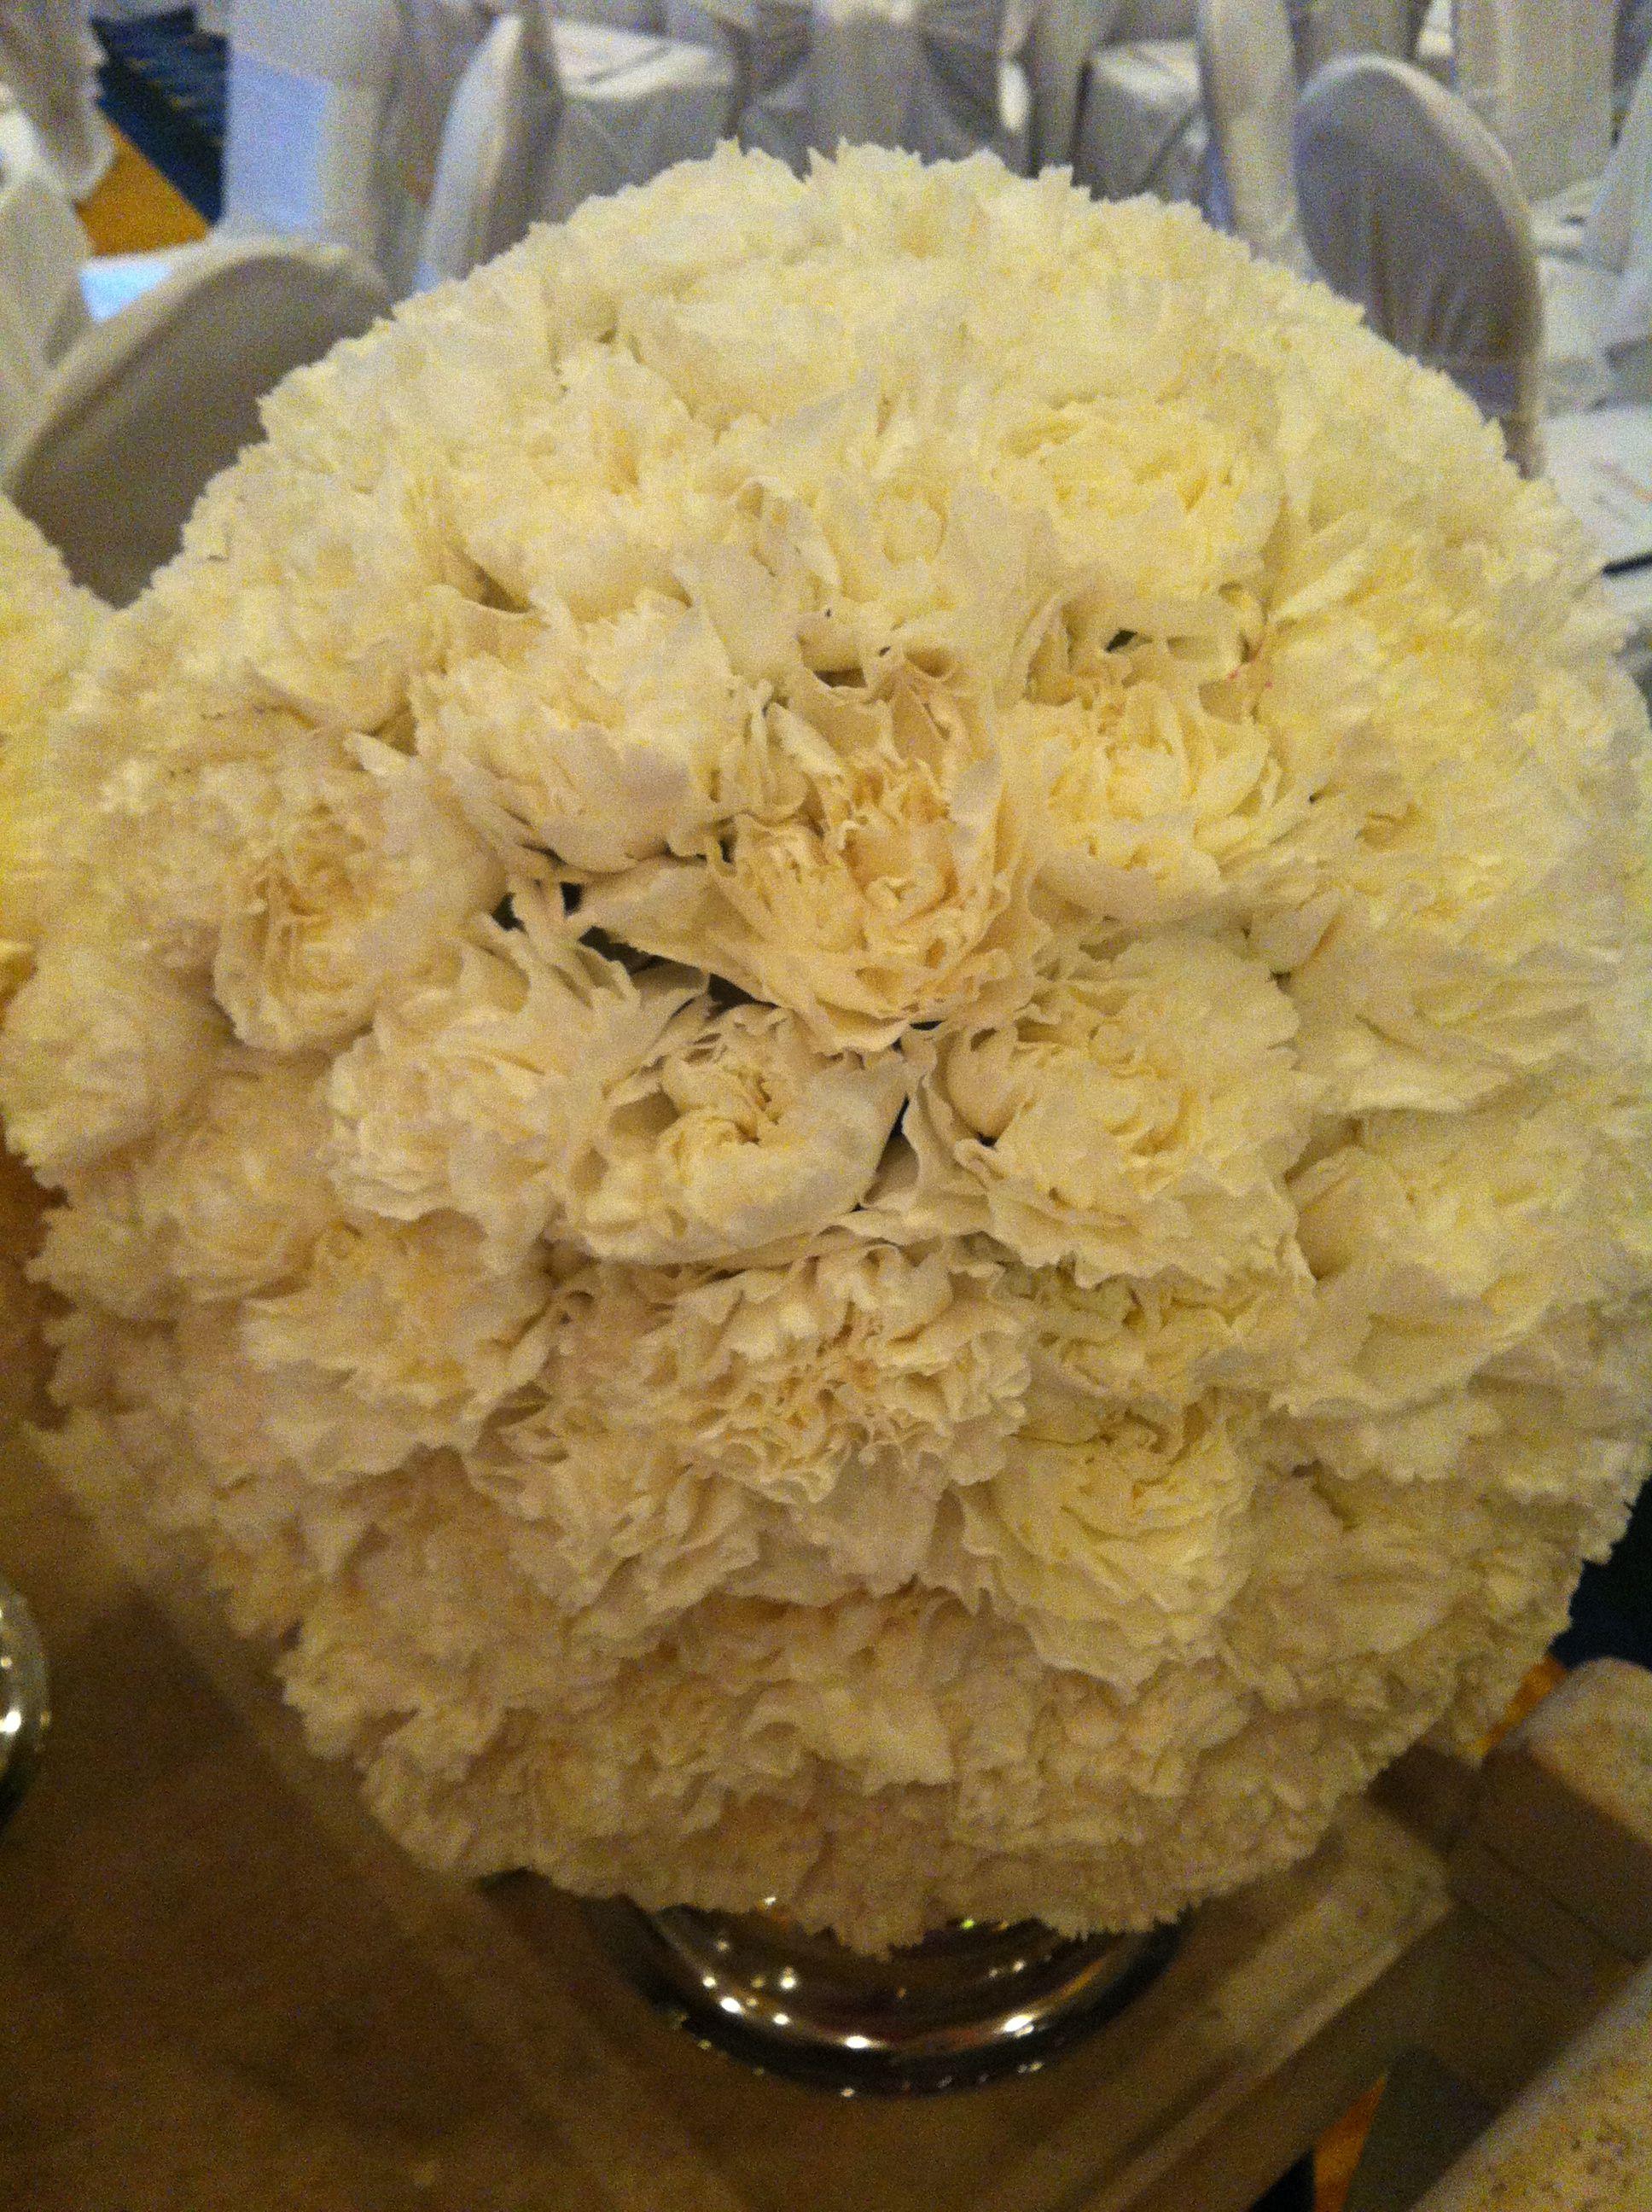 Carnation ball